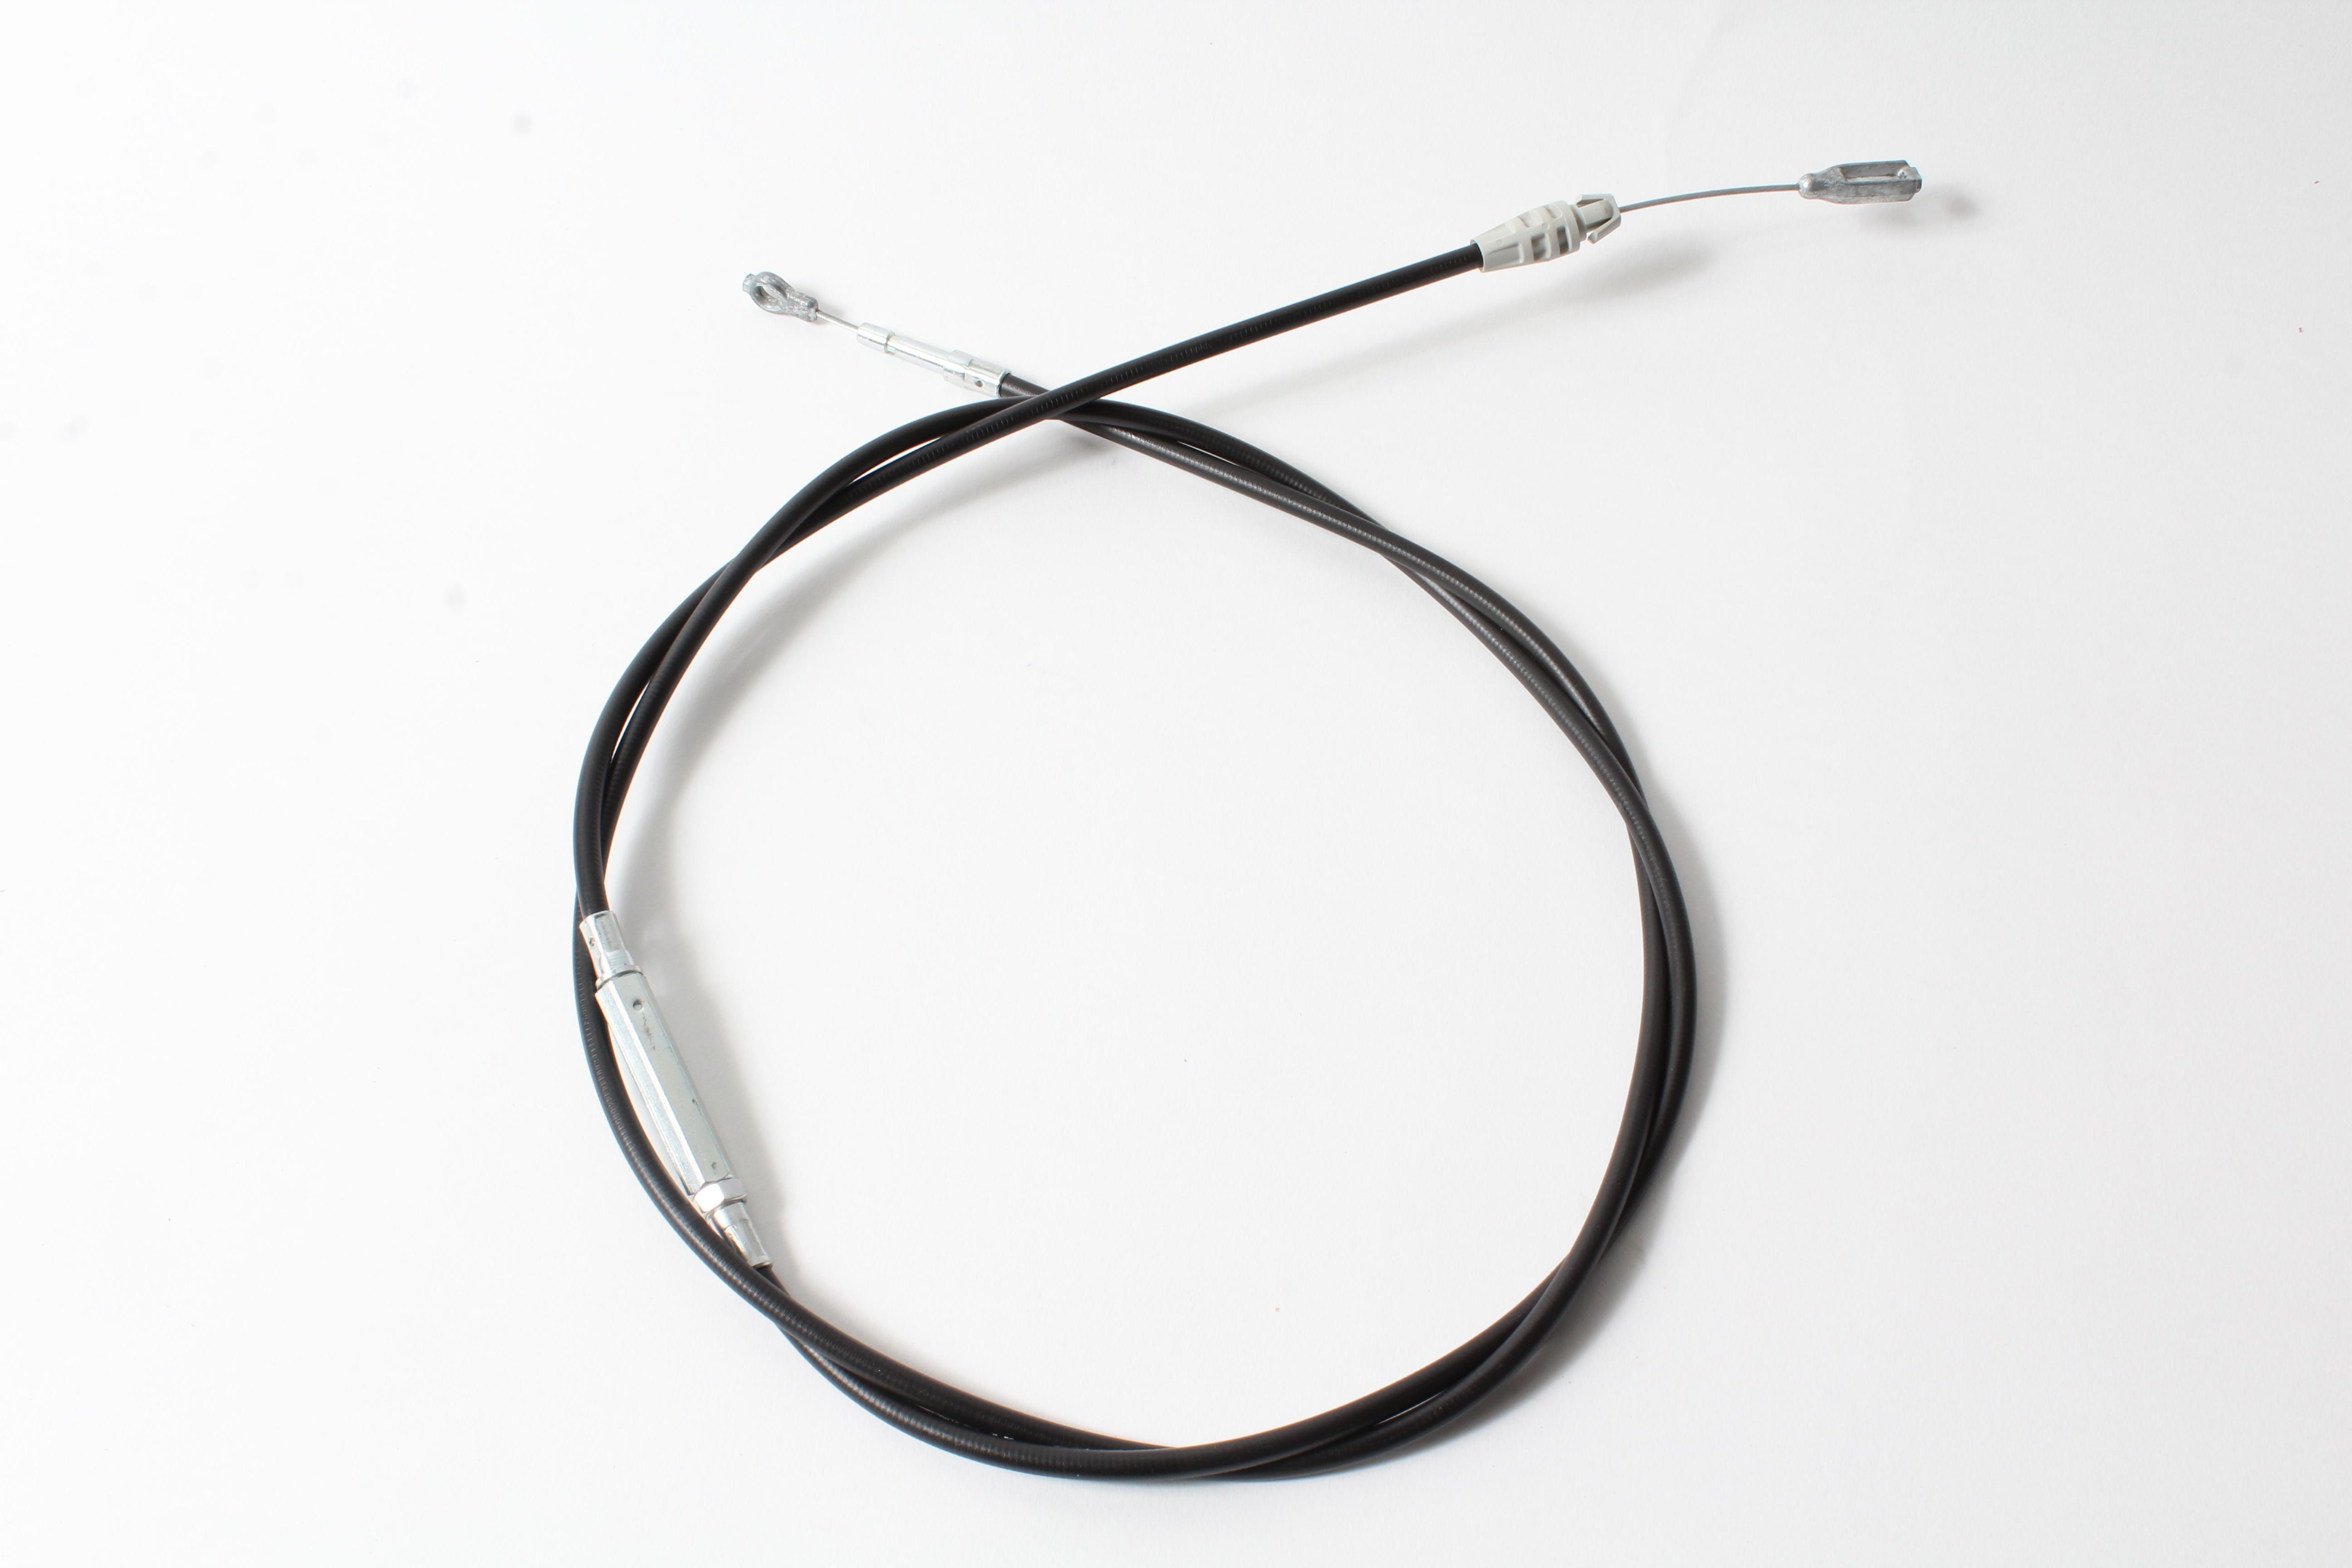 Genuine Honda 54510-VL0-P01 Clutch Cable Fits HRR216K8 OEM